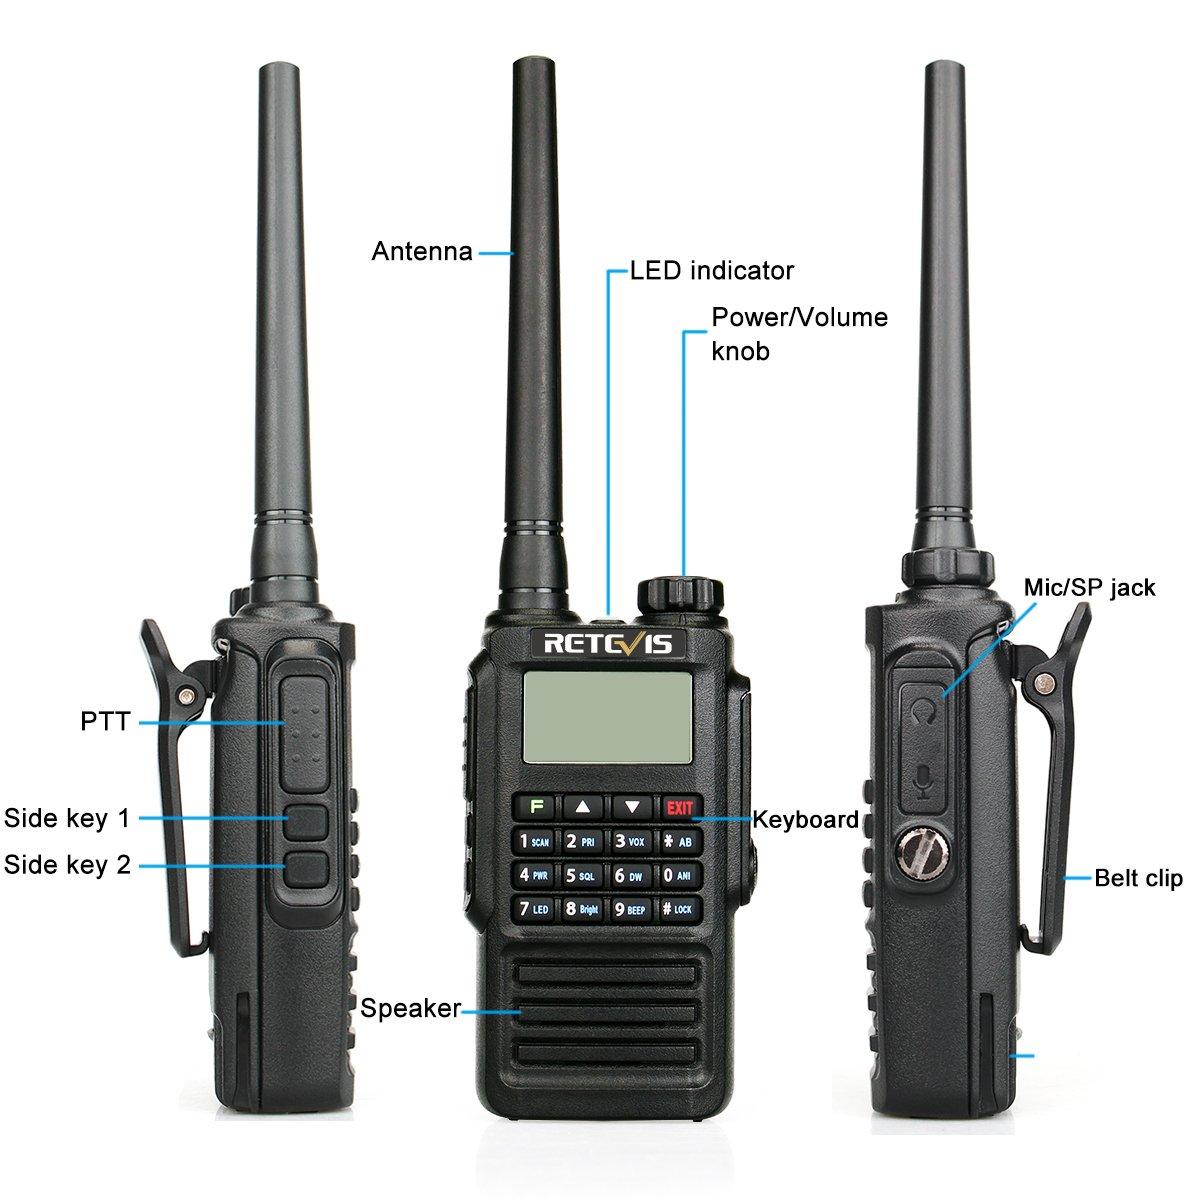 Retevis RT87 Walkie Talkie Impermeable IP67 Doble Banda 128 Canales CTCSS//DCS FM Radio VOX Alarma de Emergencia MSK//DTMF 2T Negro, 1 Pack 5T Pantalla LCD